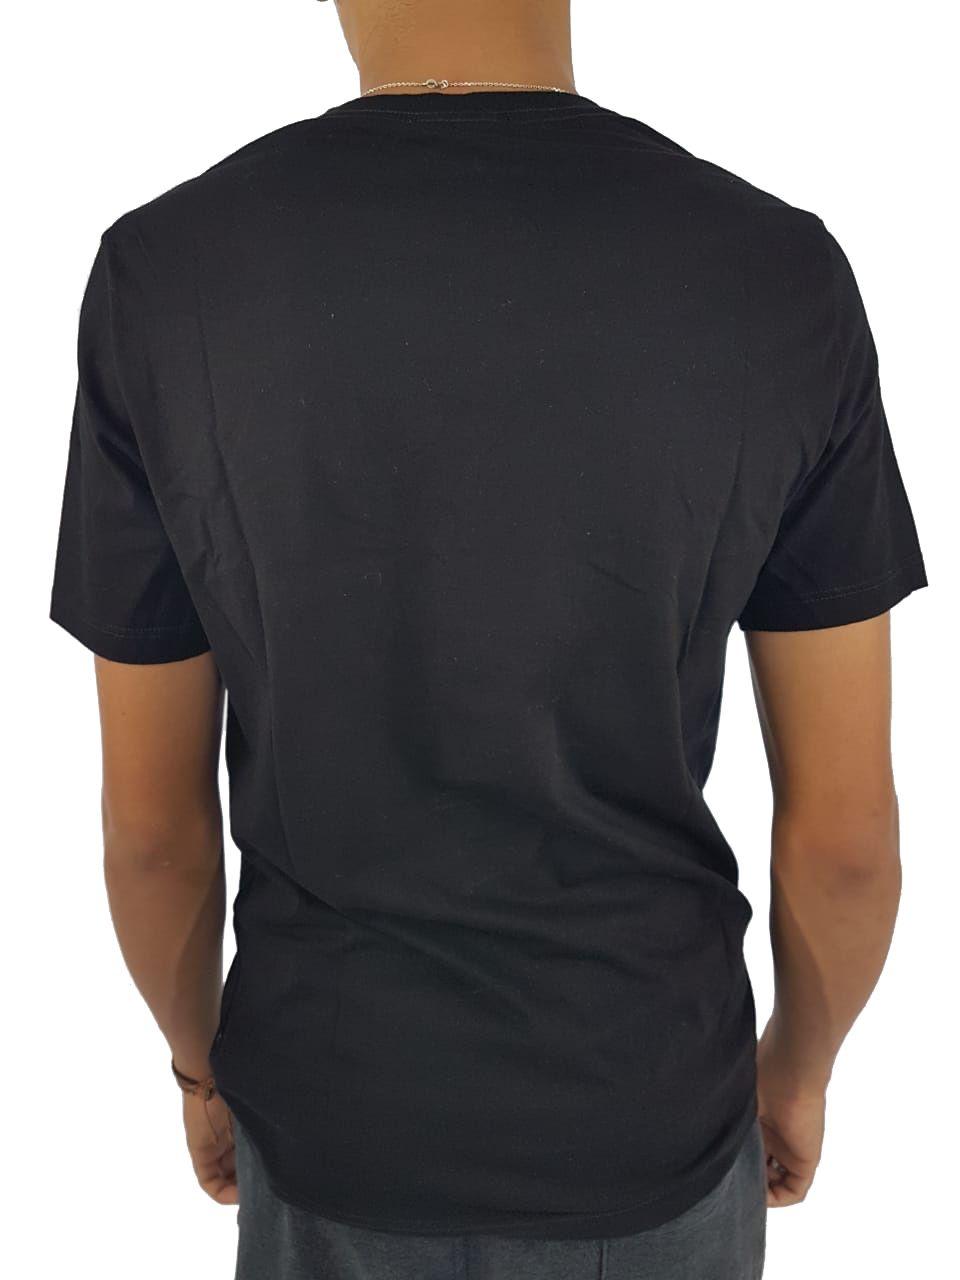 Camiseta Cavalera Masculina Manga Curta Bolso